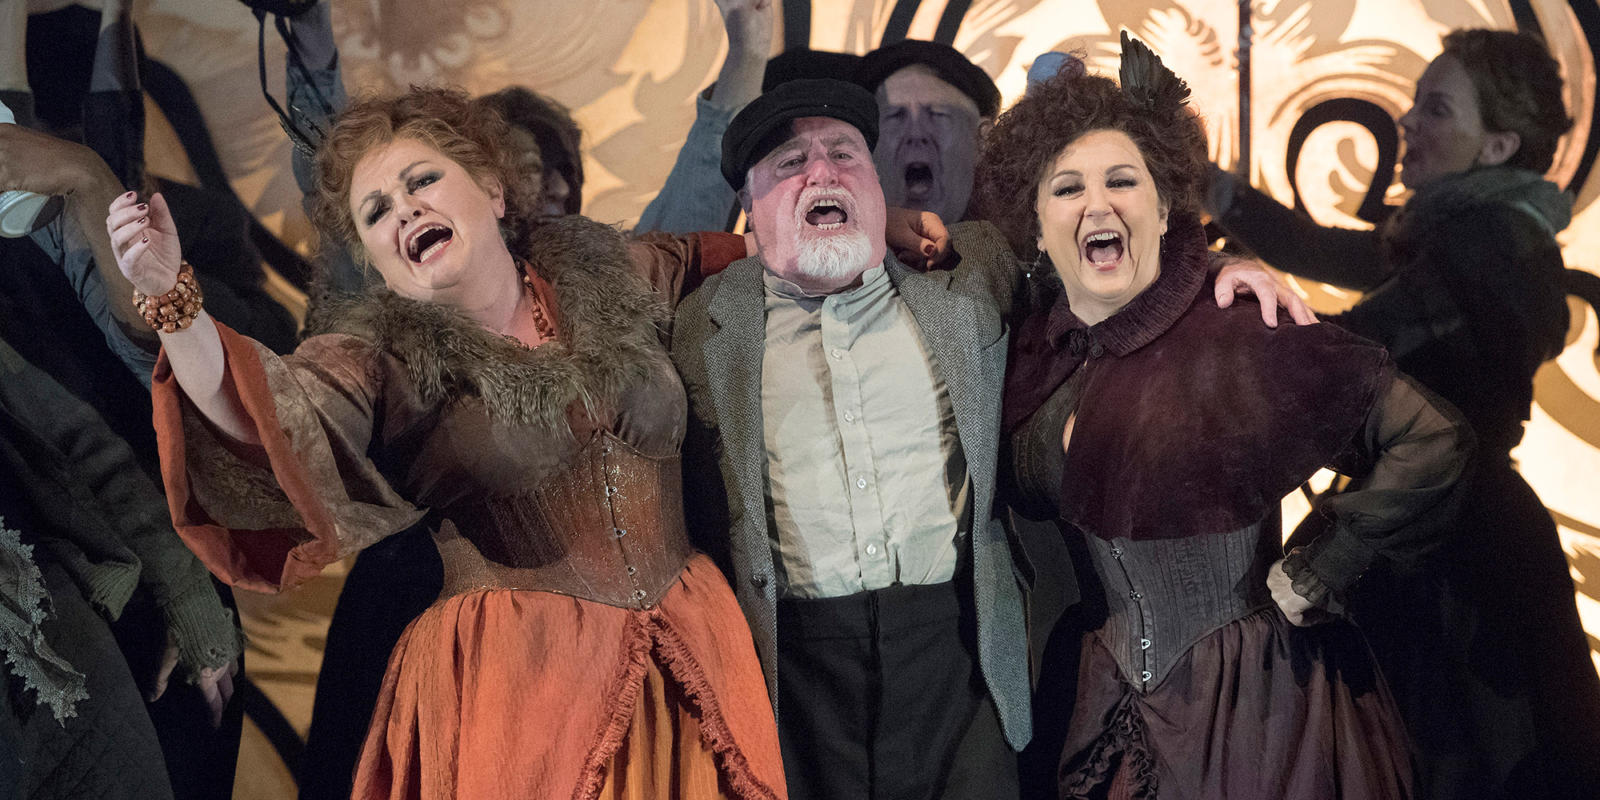 ENO 2018/19 Jack the Ripper: The Women of Whitechapel: Susan Bullock and Lesley Garrett with Murray Kimmins © Alastair Muir